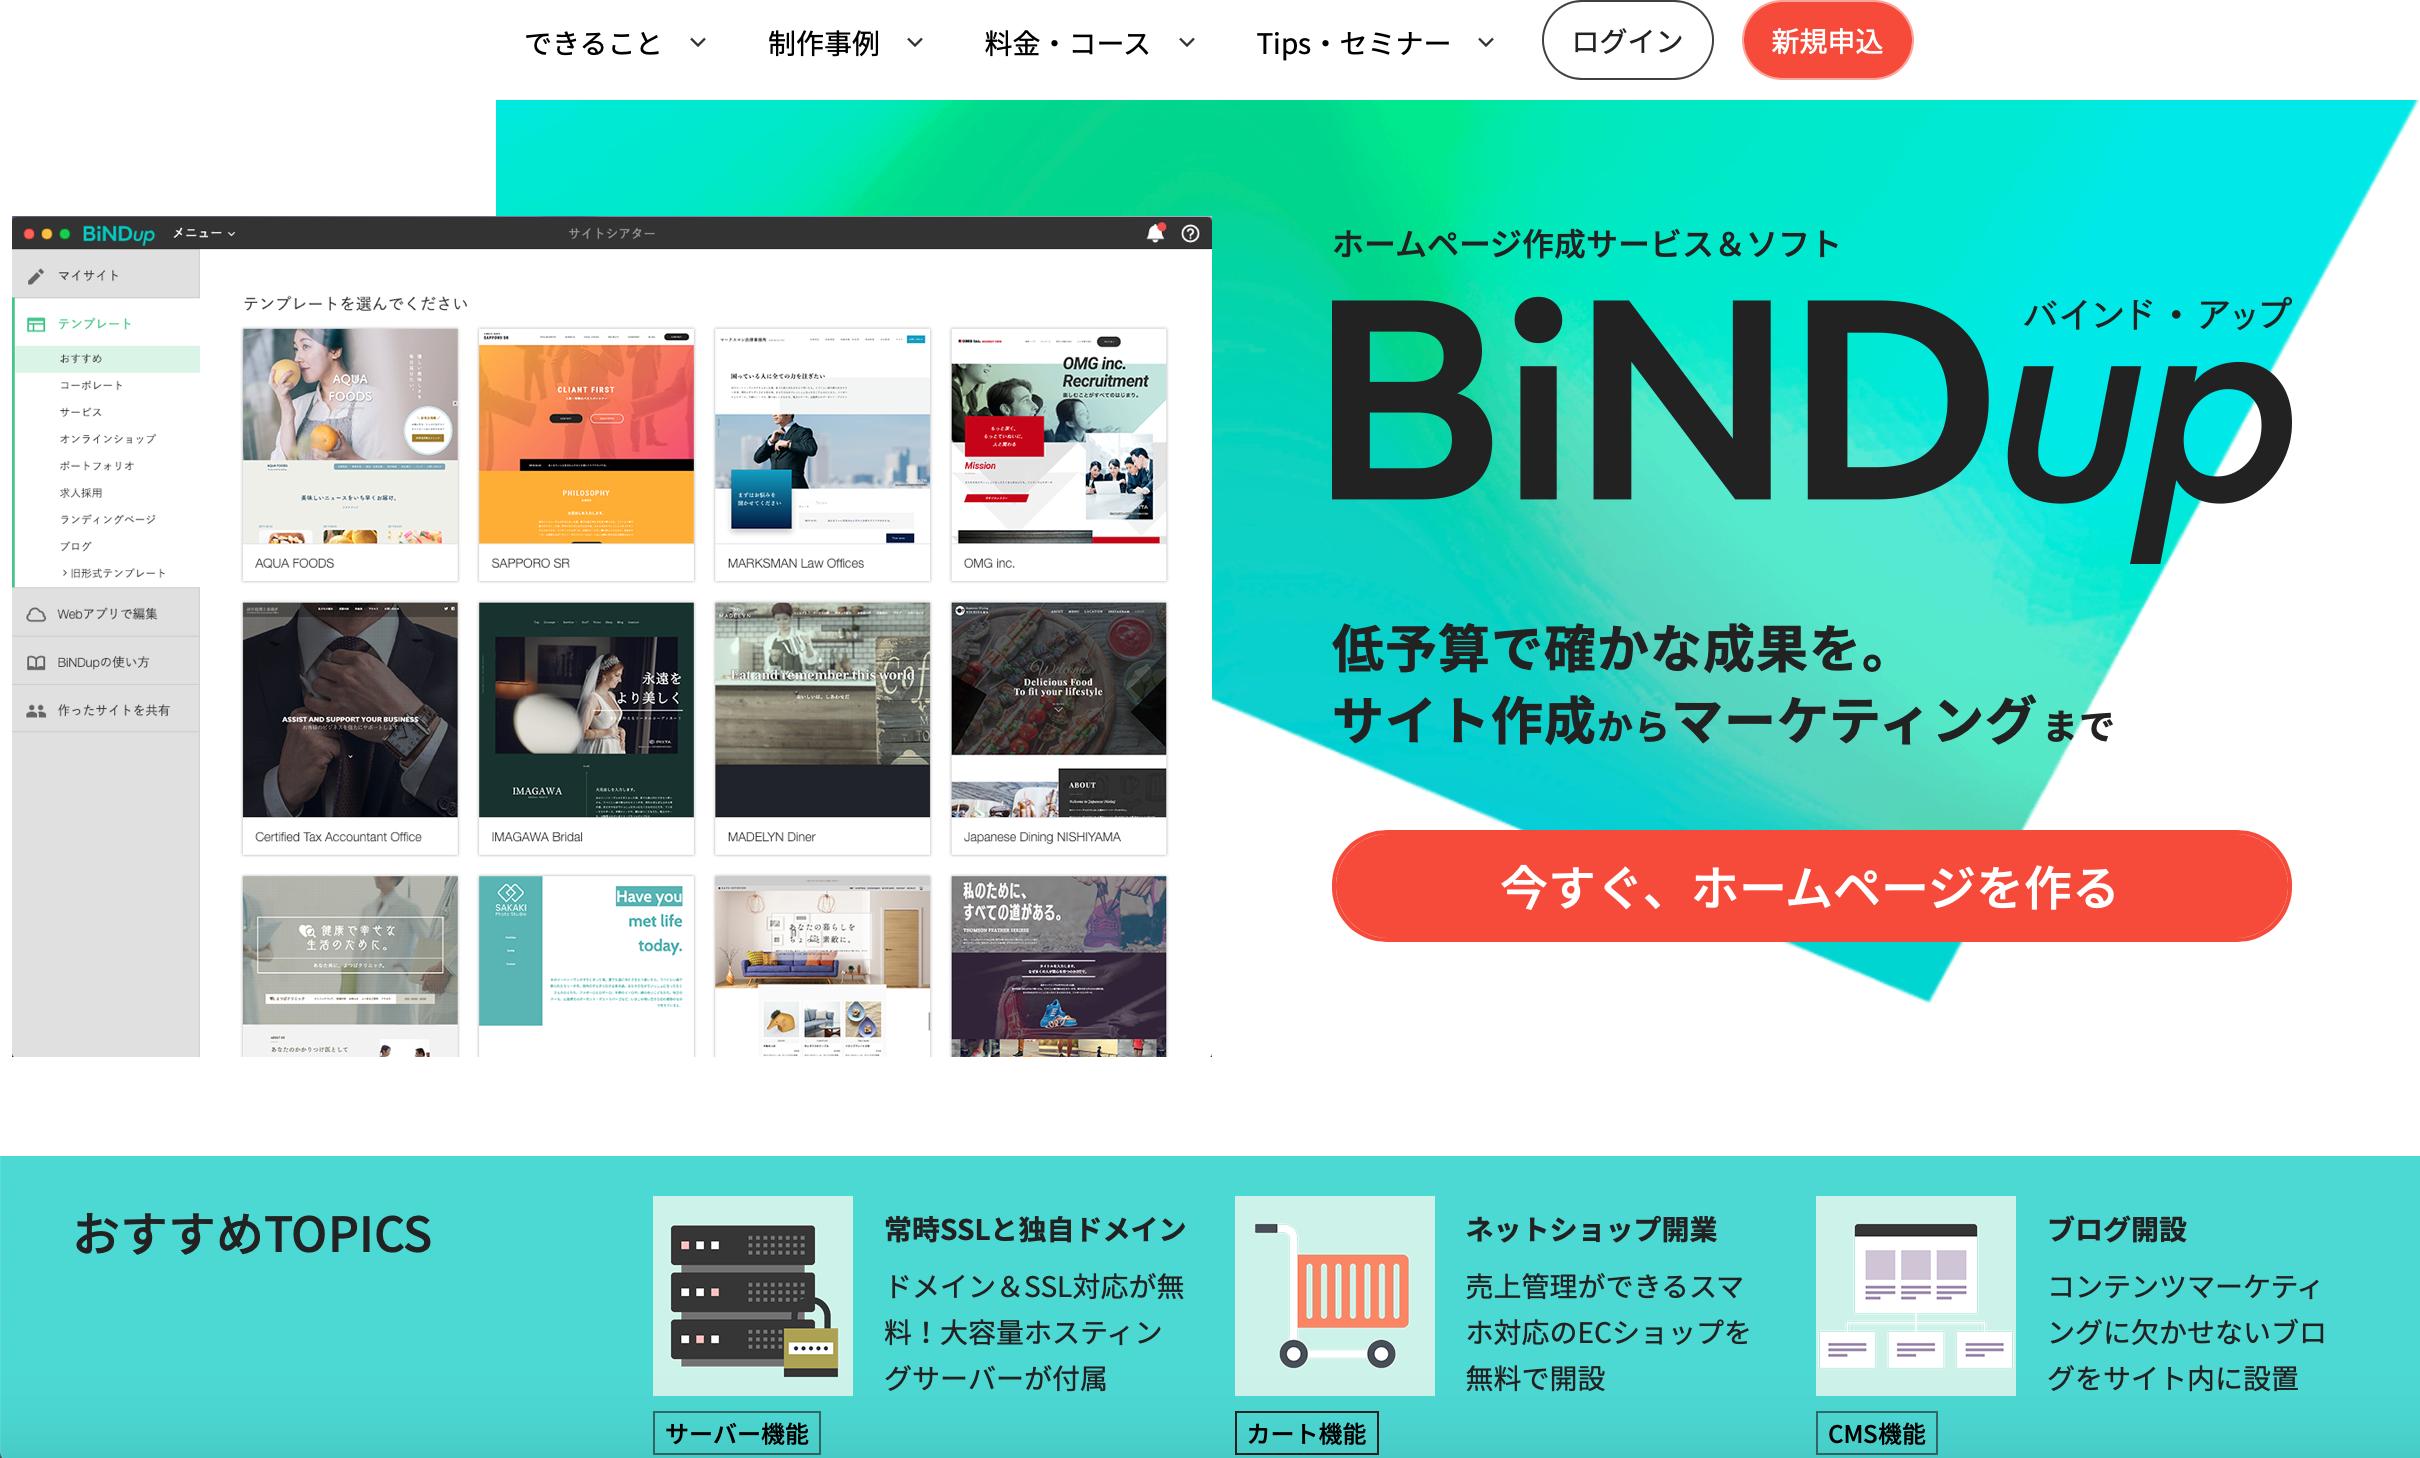 BiNDupサービスサイト